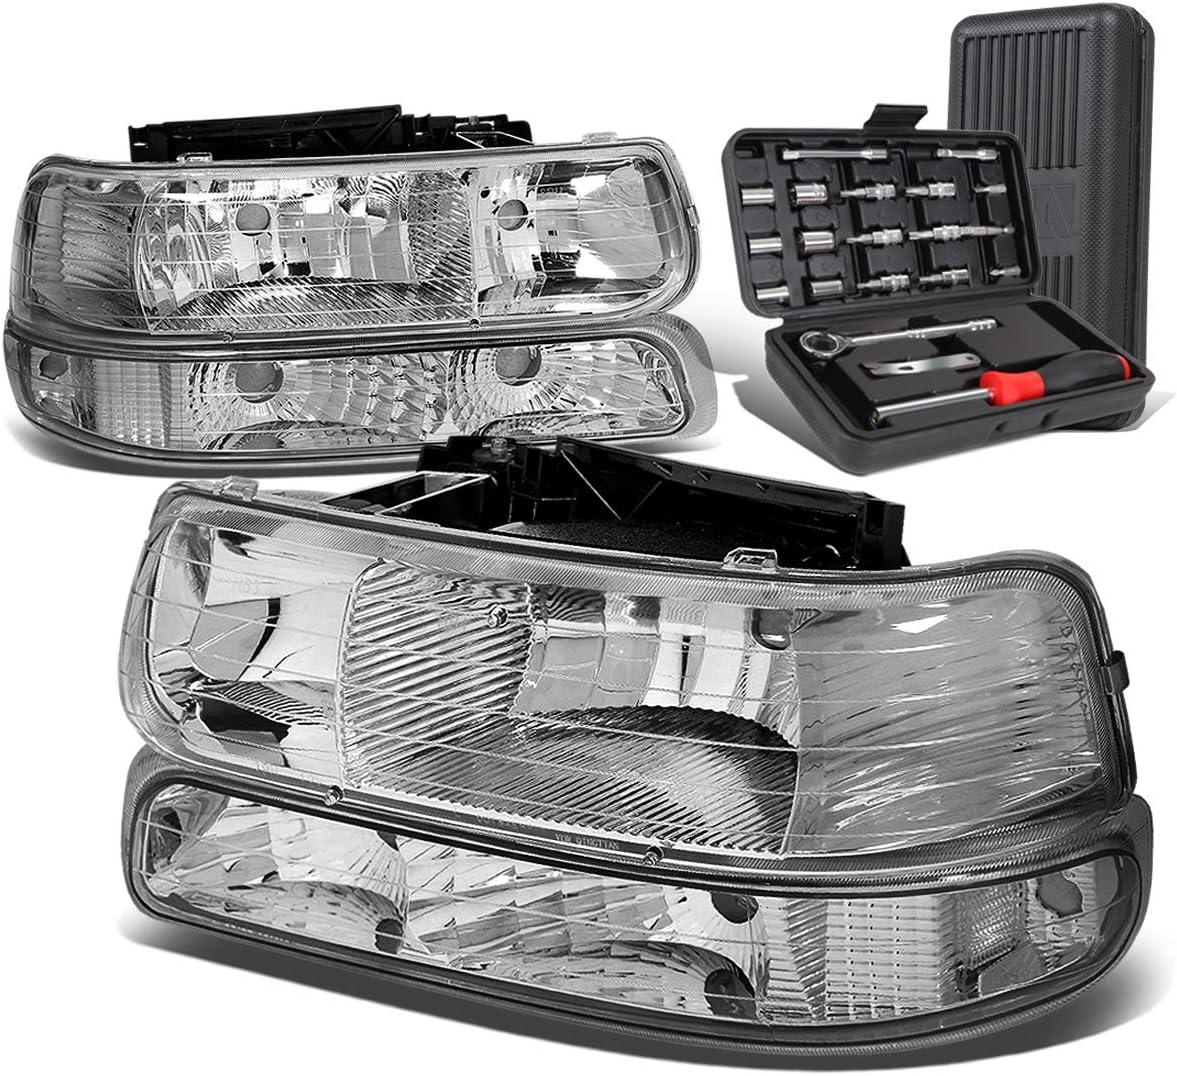 Chrome Housing Clear Corner Headlight w 商店 Kit 超目玉 Re Bumper Lamps+Tool